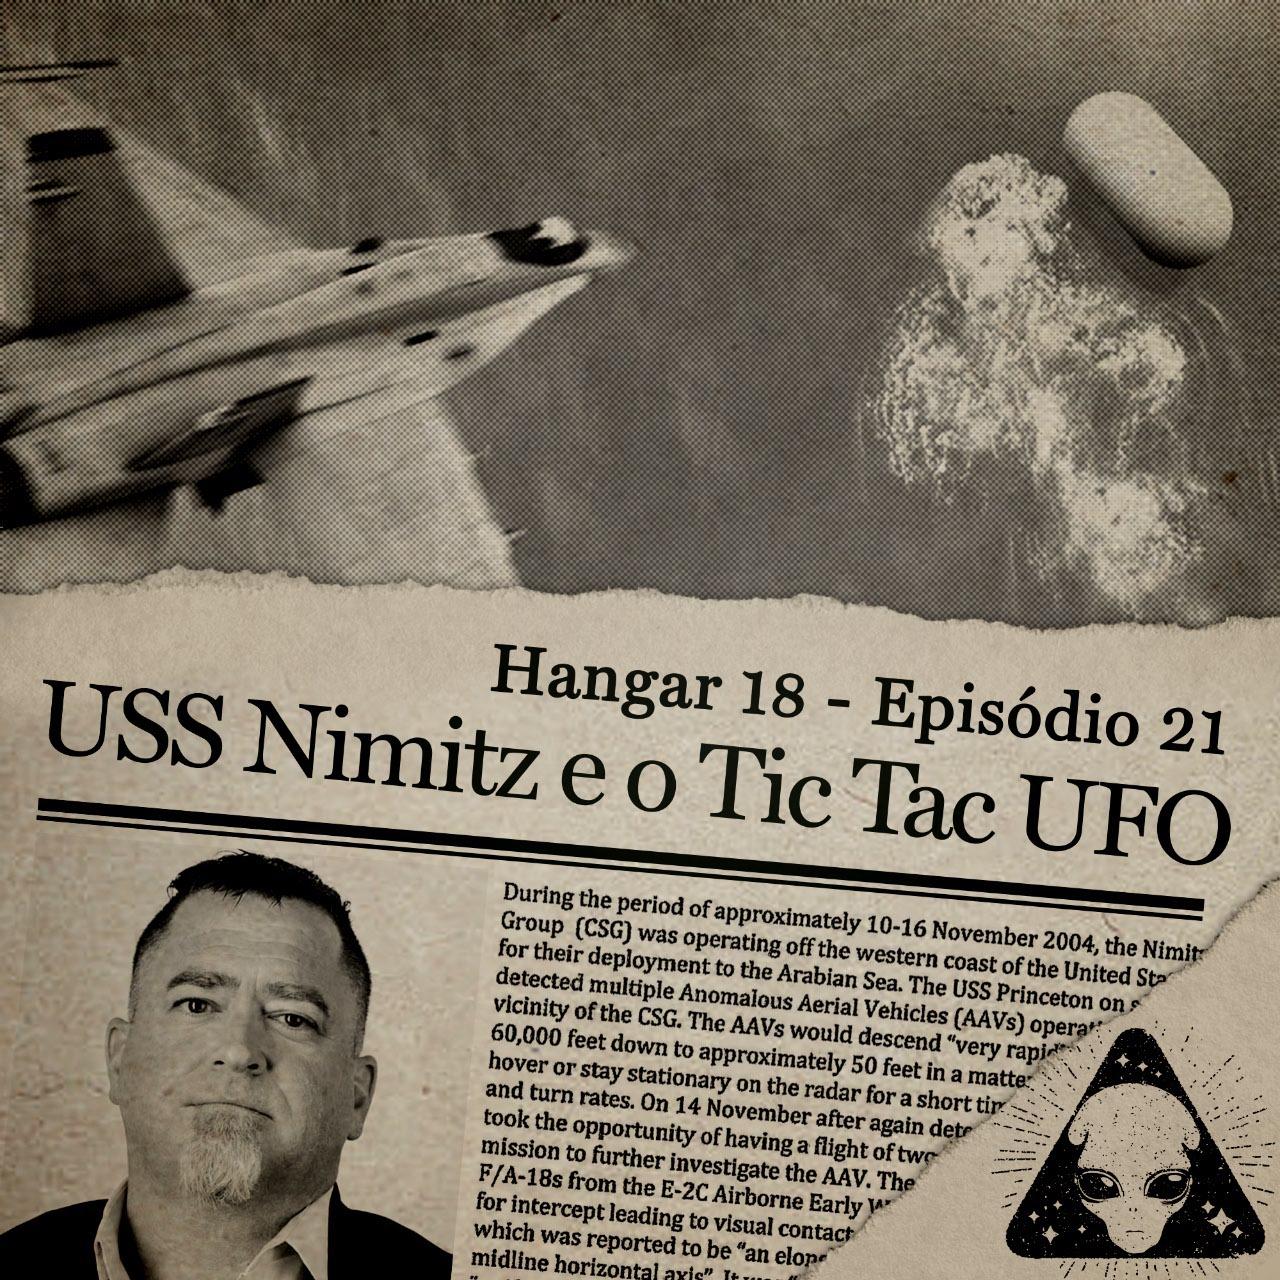 Hangar 18 - Ep 021 - USS Nimitz e o Tic Tac UFO